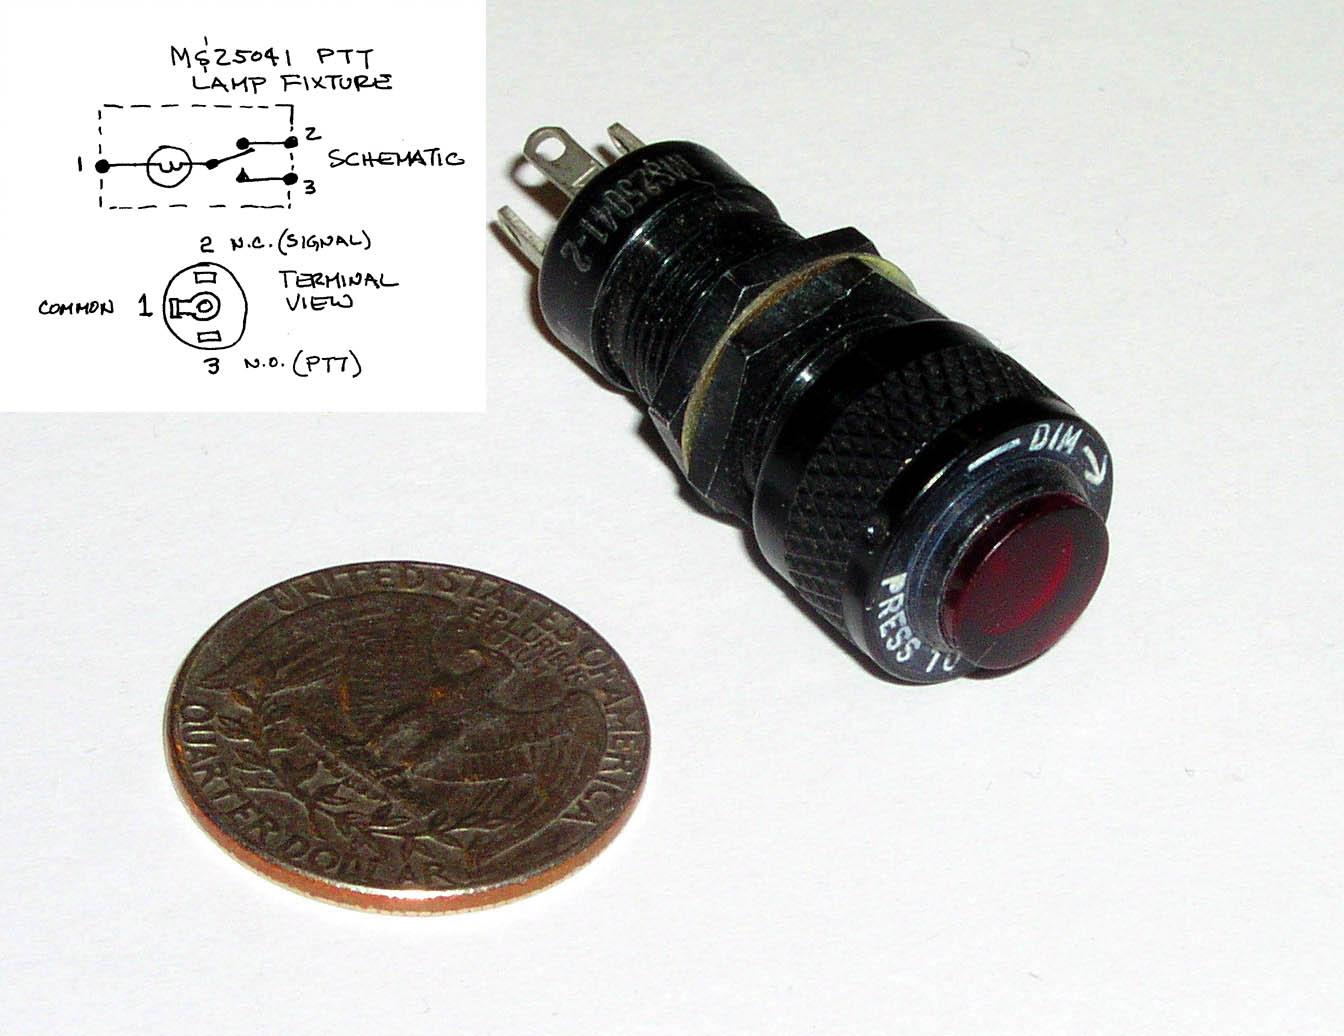 hight resolution of http aeroelectric com pictures lighting ptt dim fixture jpg